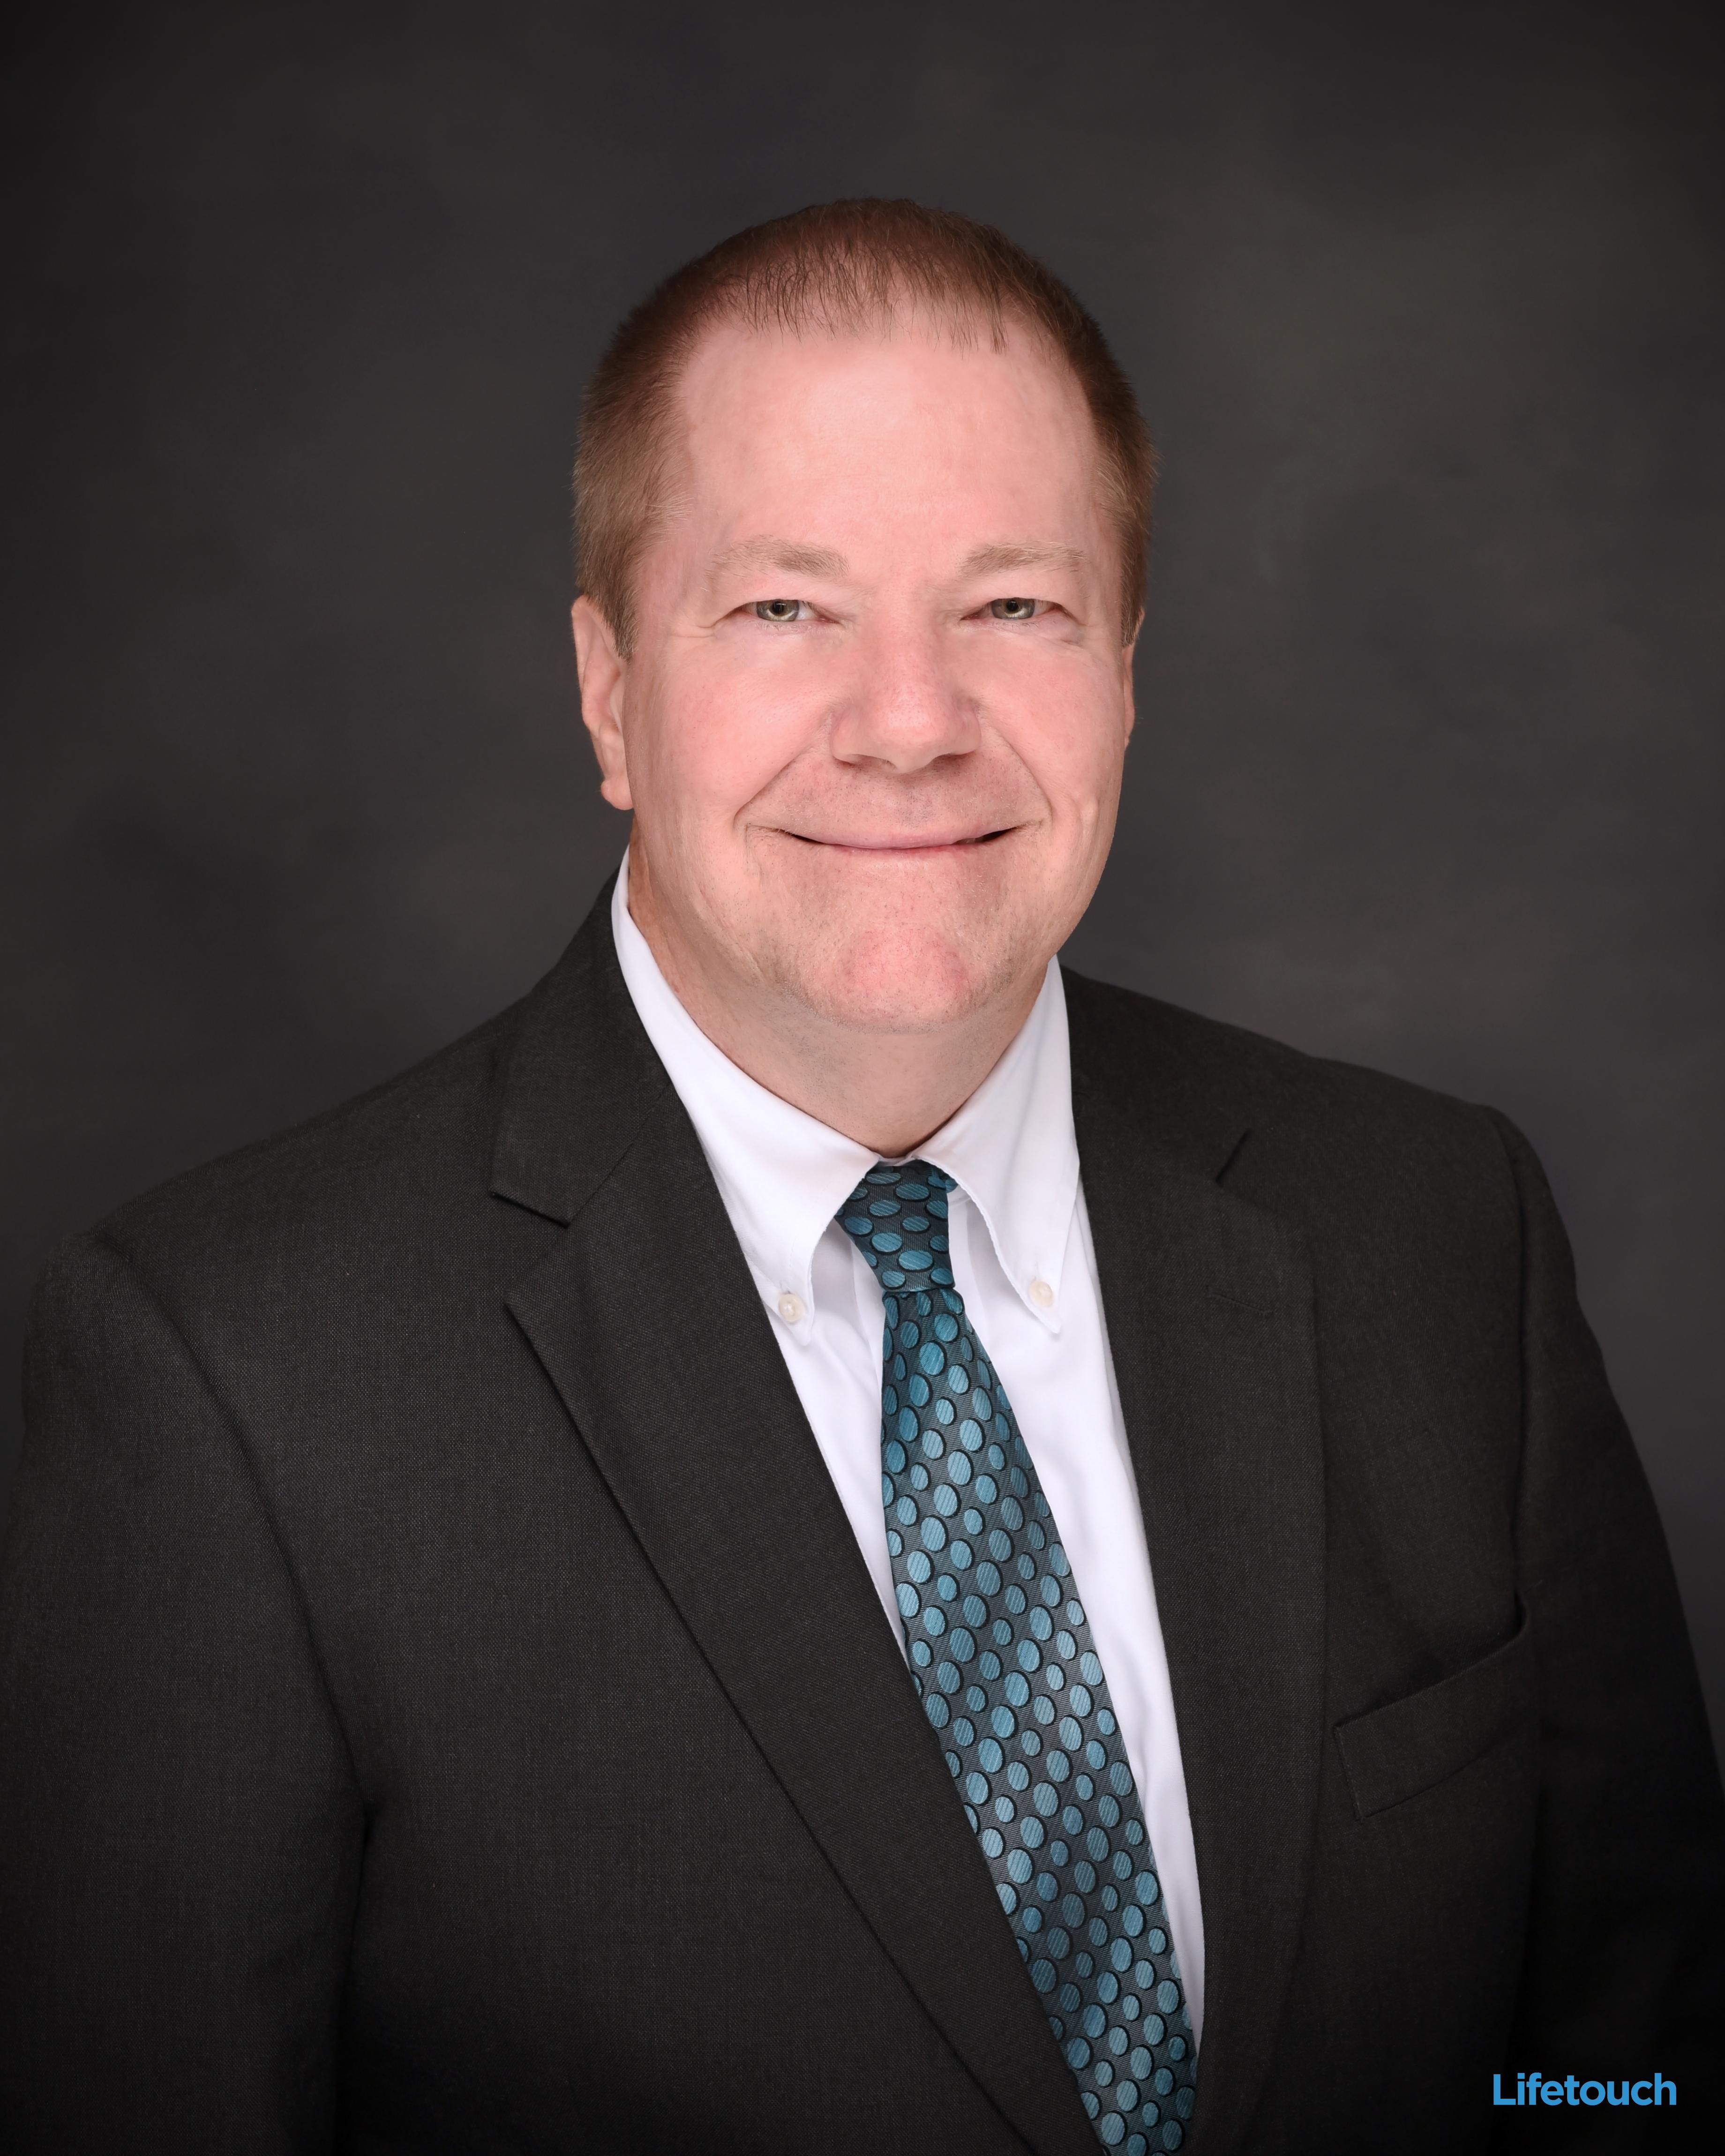 Dr. David M. Benson